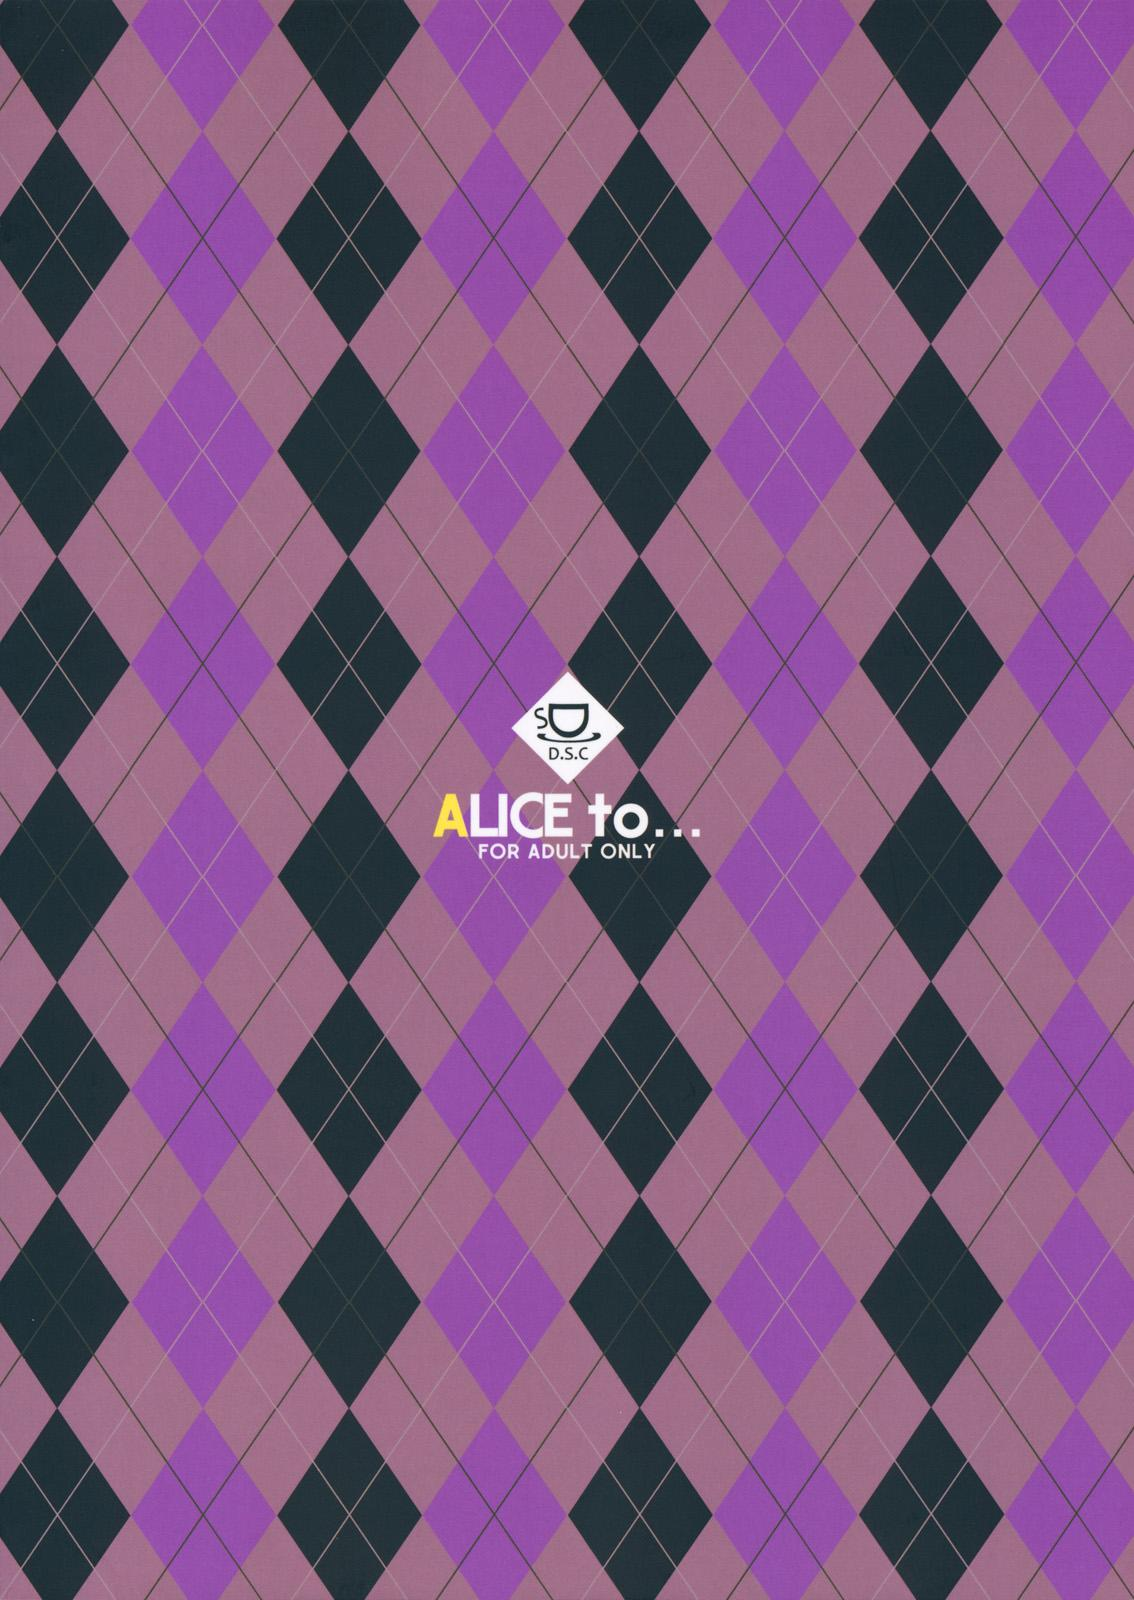 ALICE to... 27